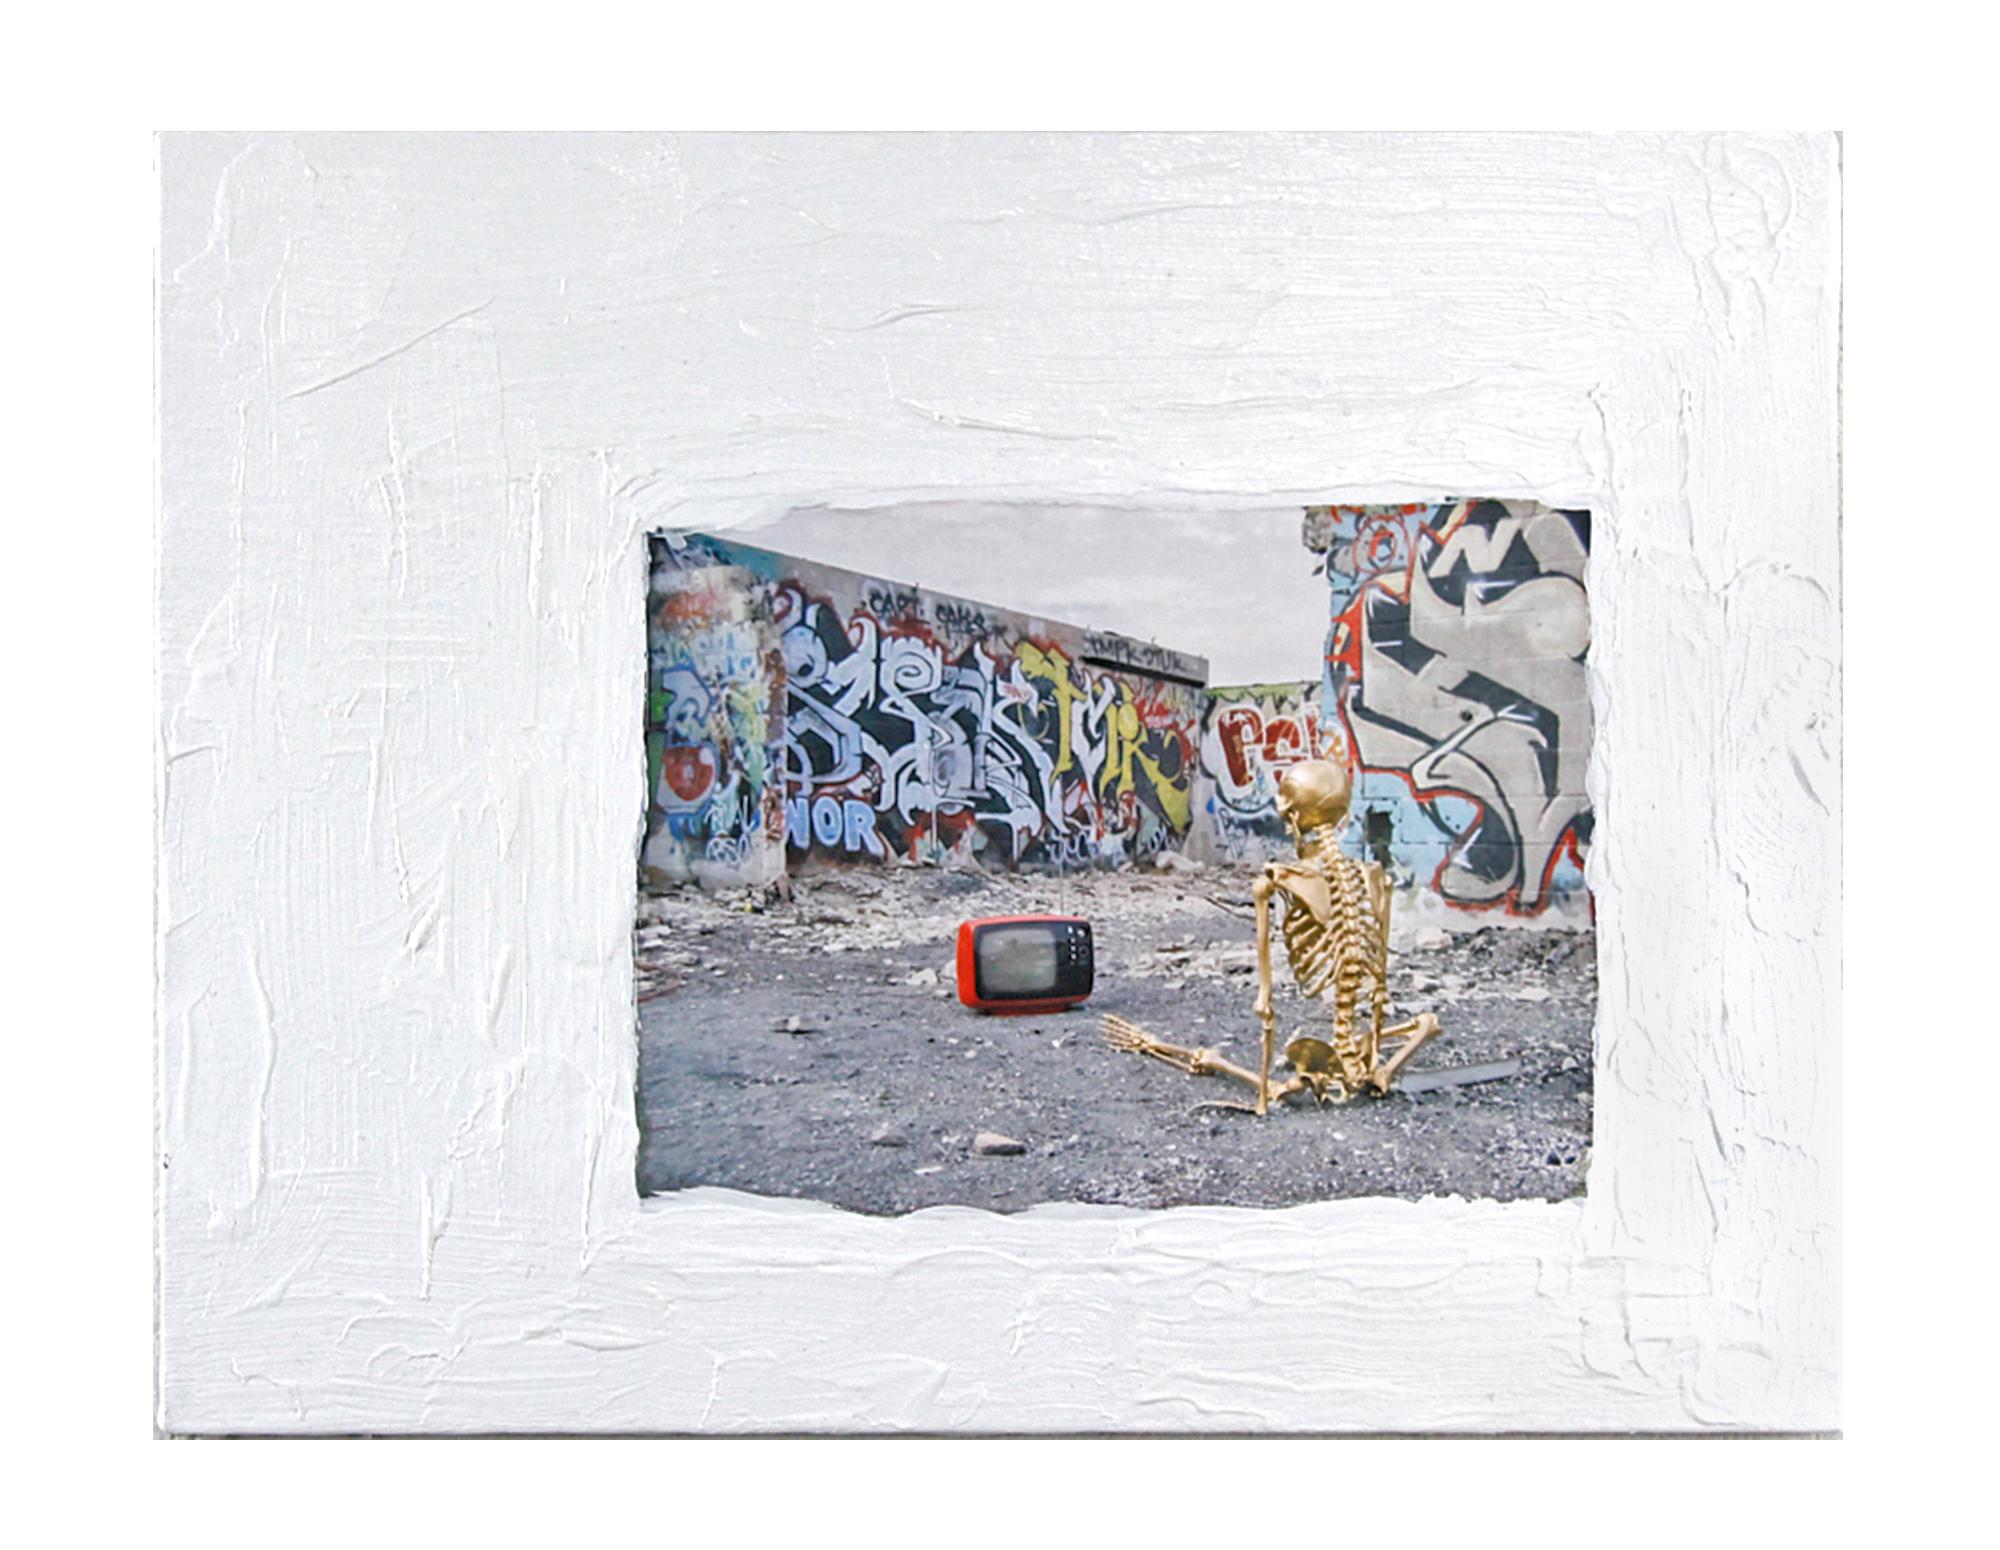 False Idols Before Me   2013  Acrylic paint and digital print on canvas  14x18